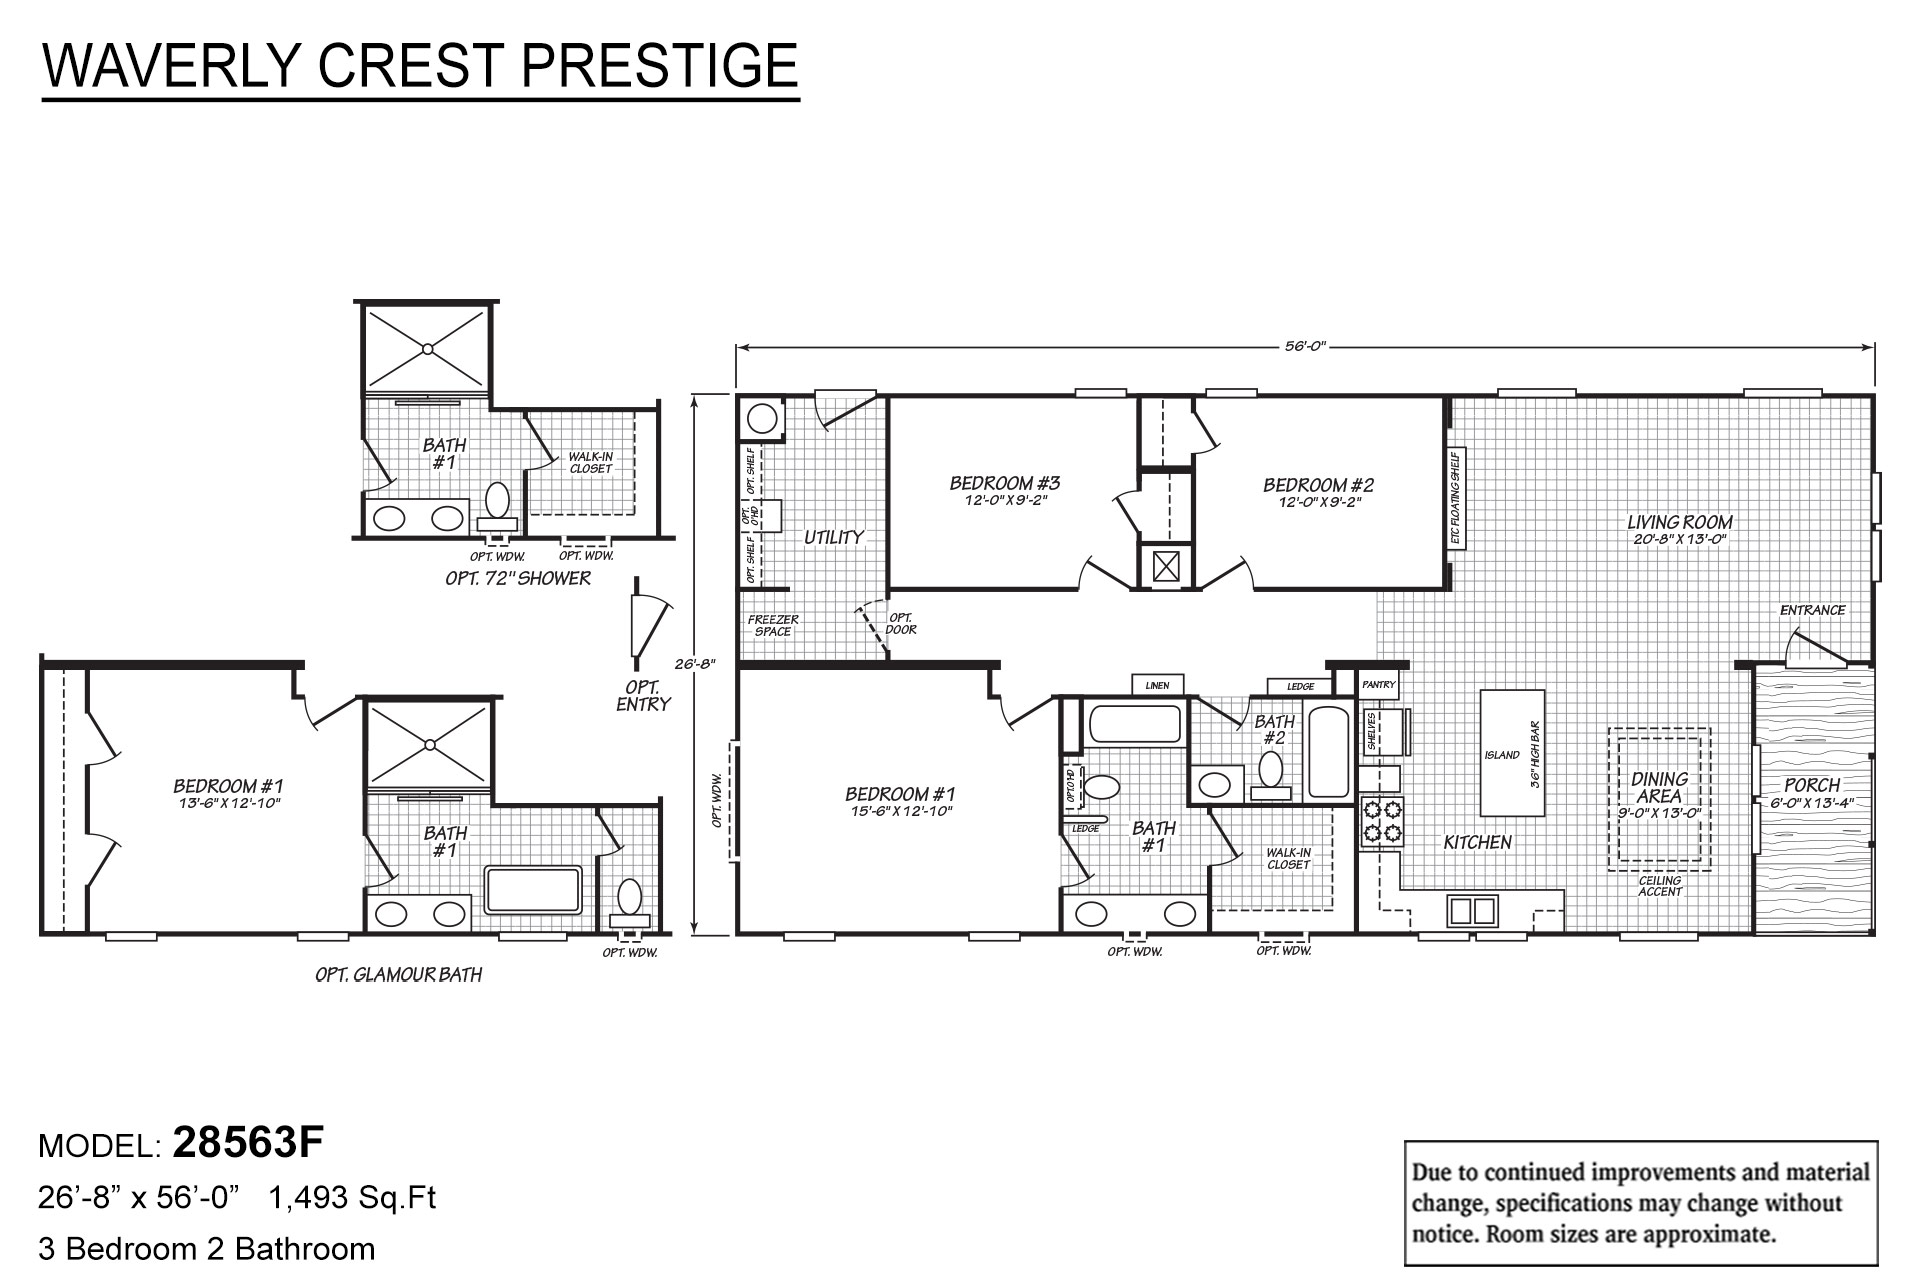 Waverly Crest Prestige - 28563F The South Fork